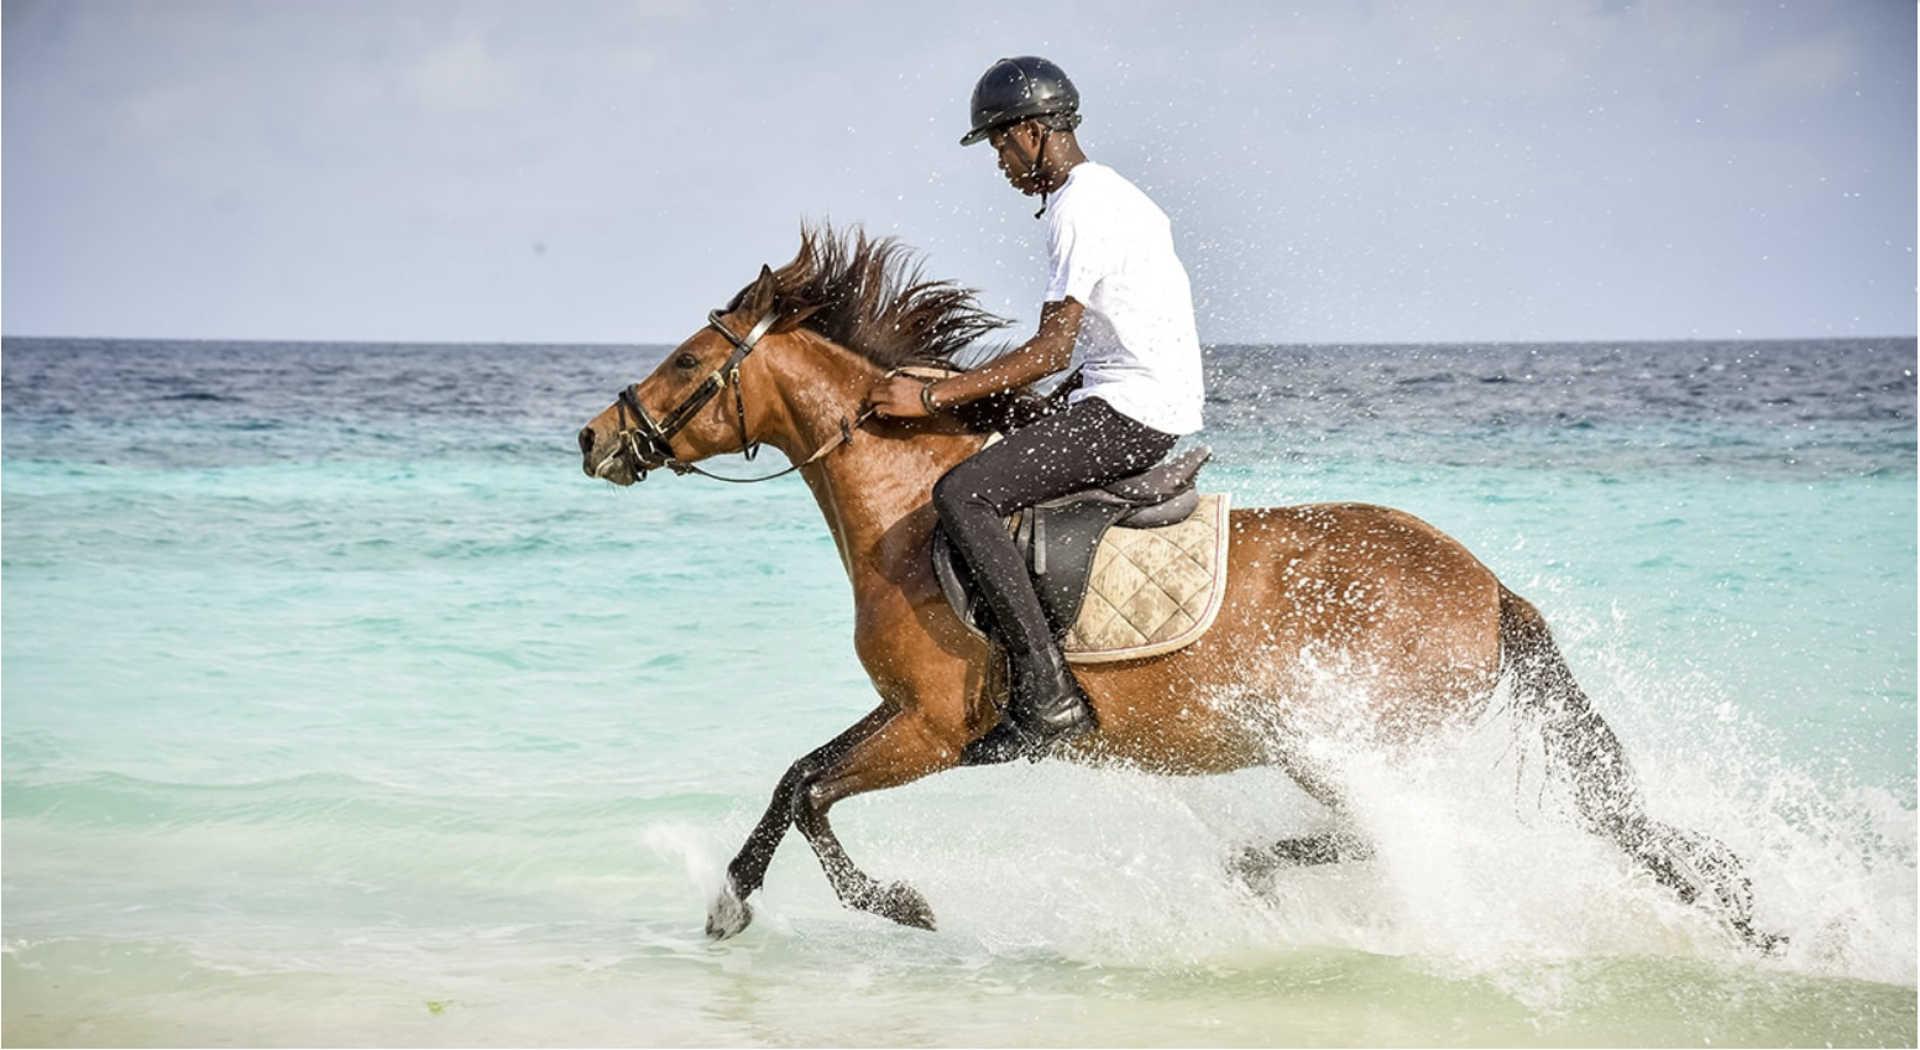 Zanzibar horseback riding